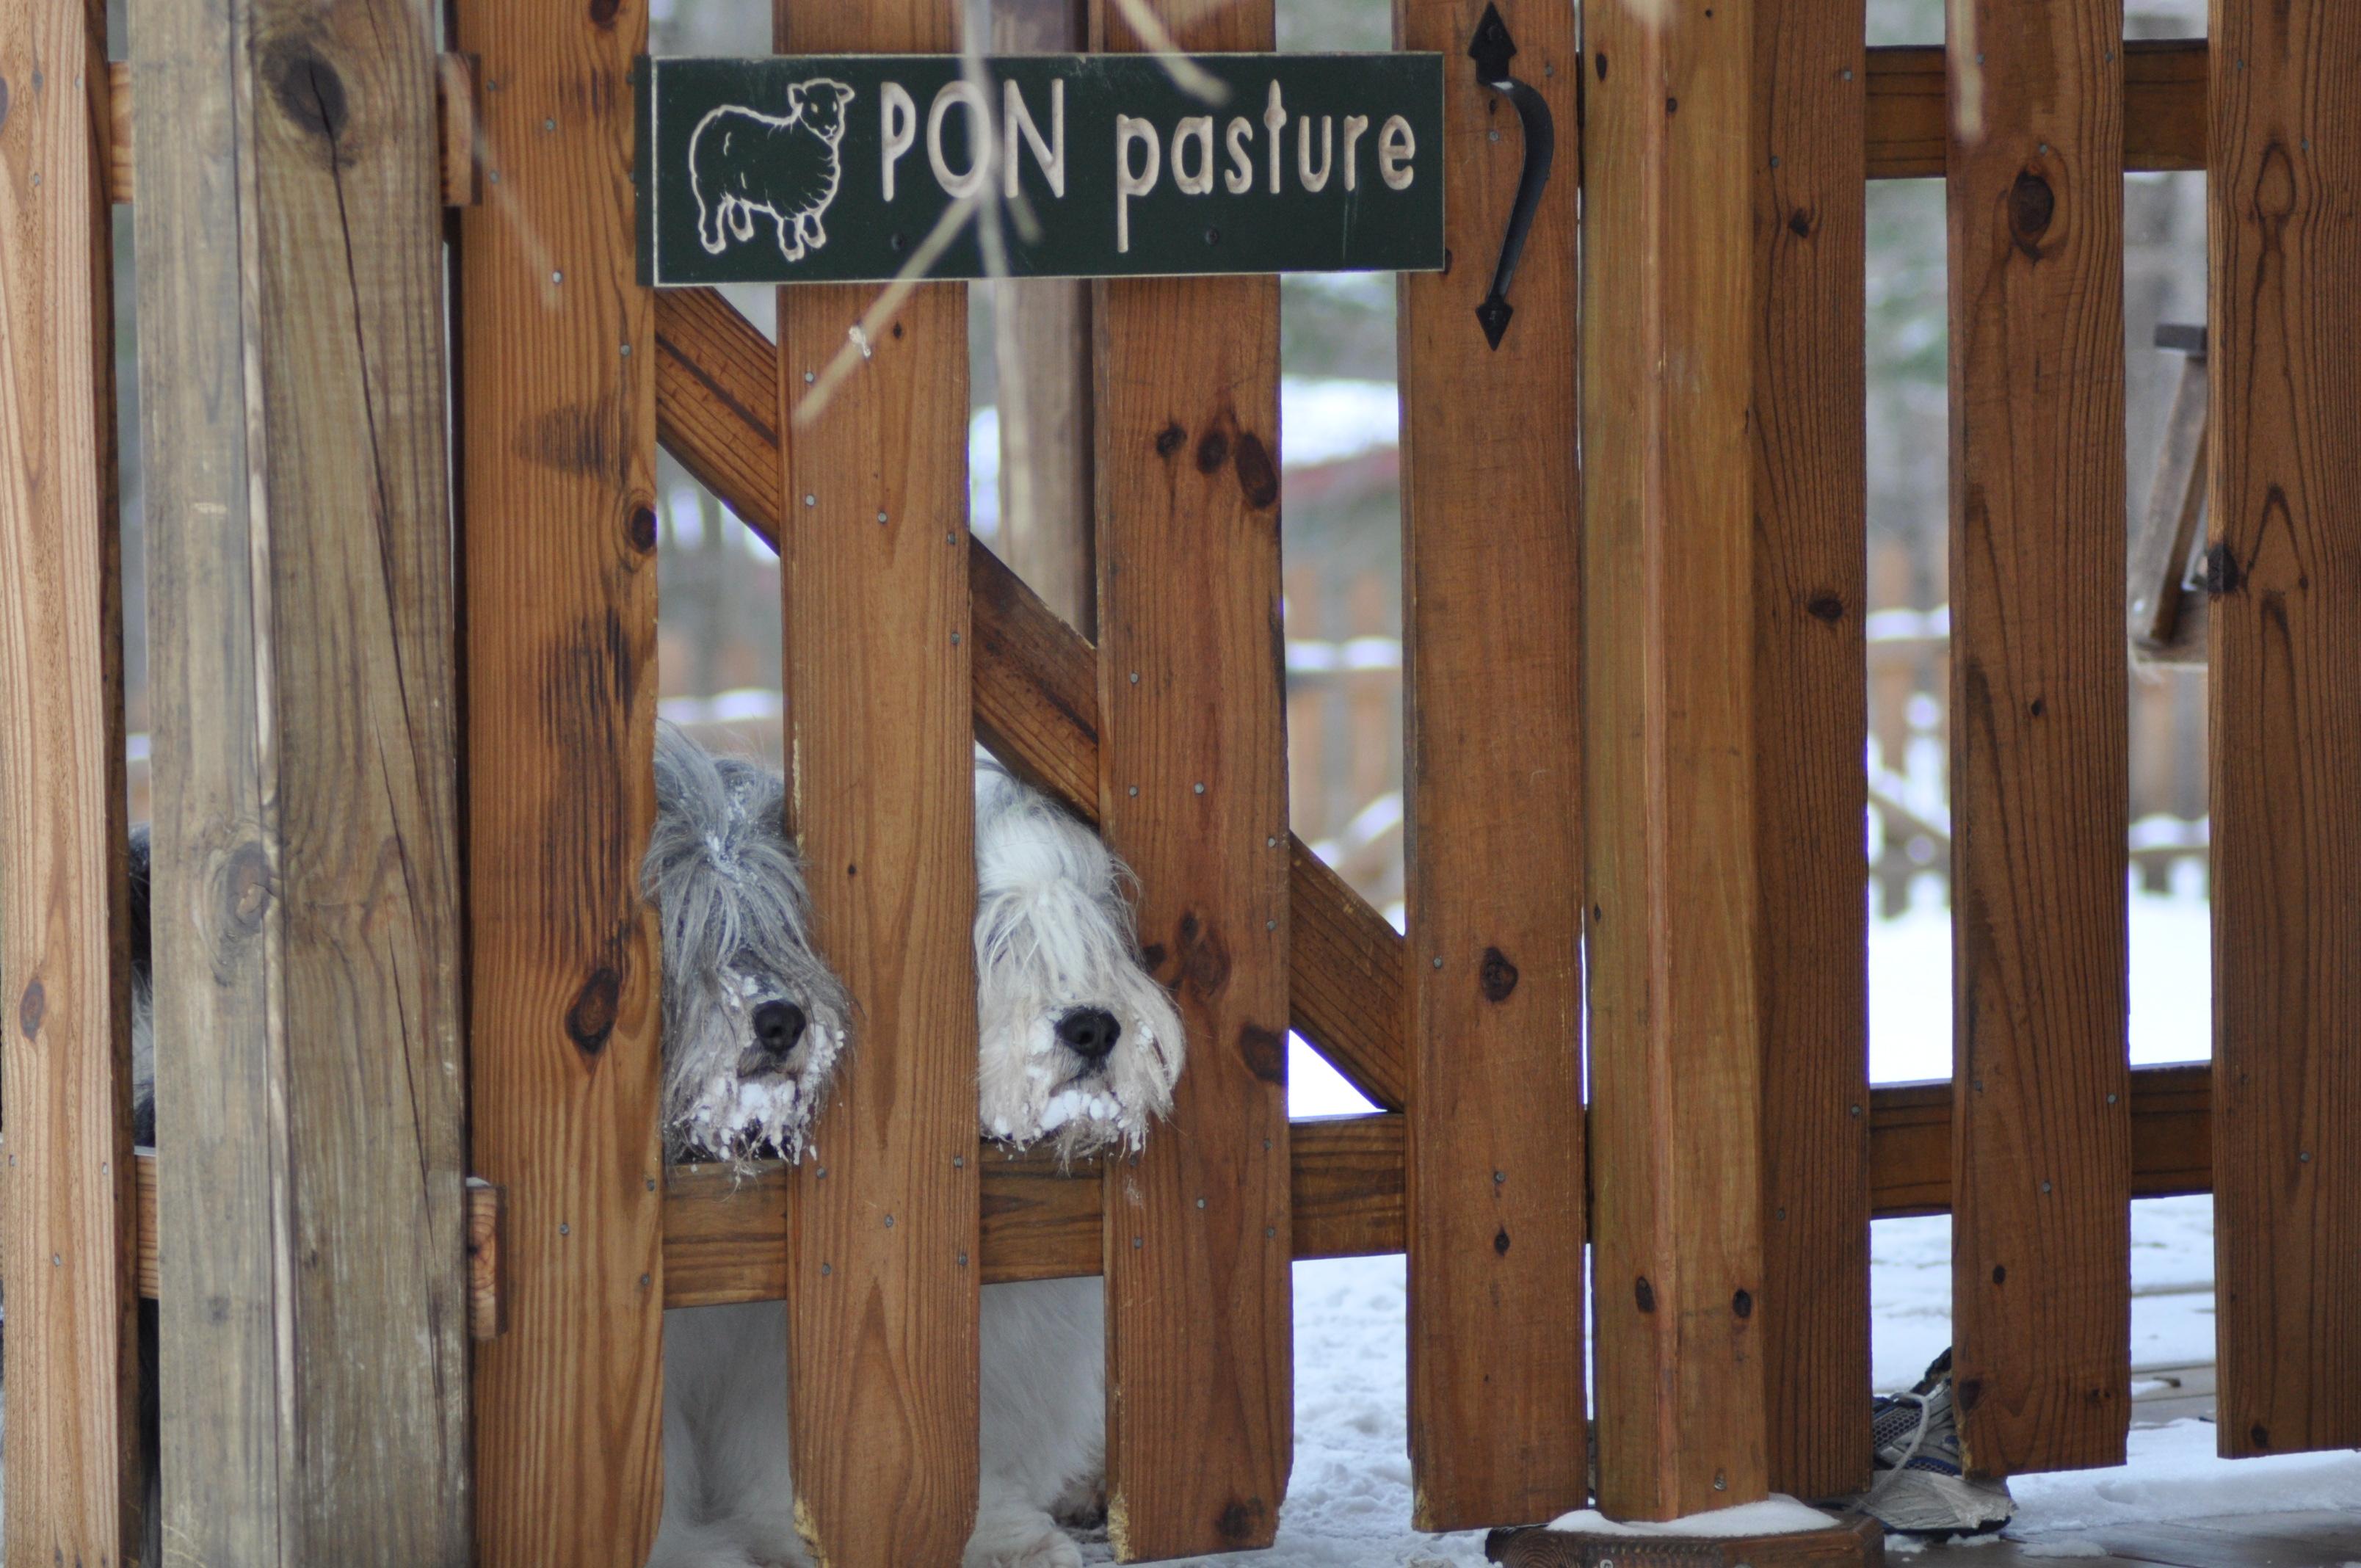 Pon Pasture